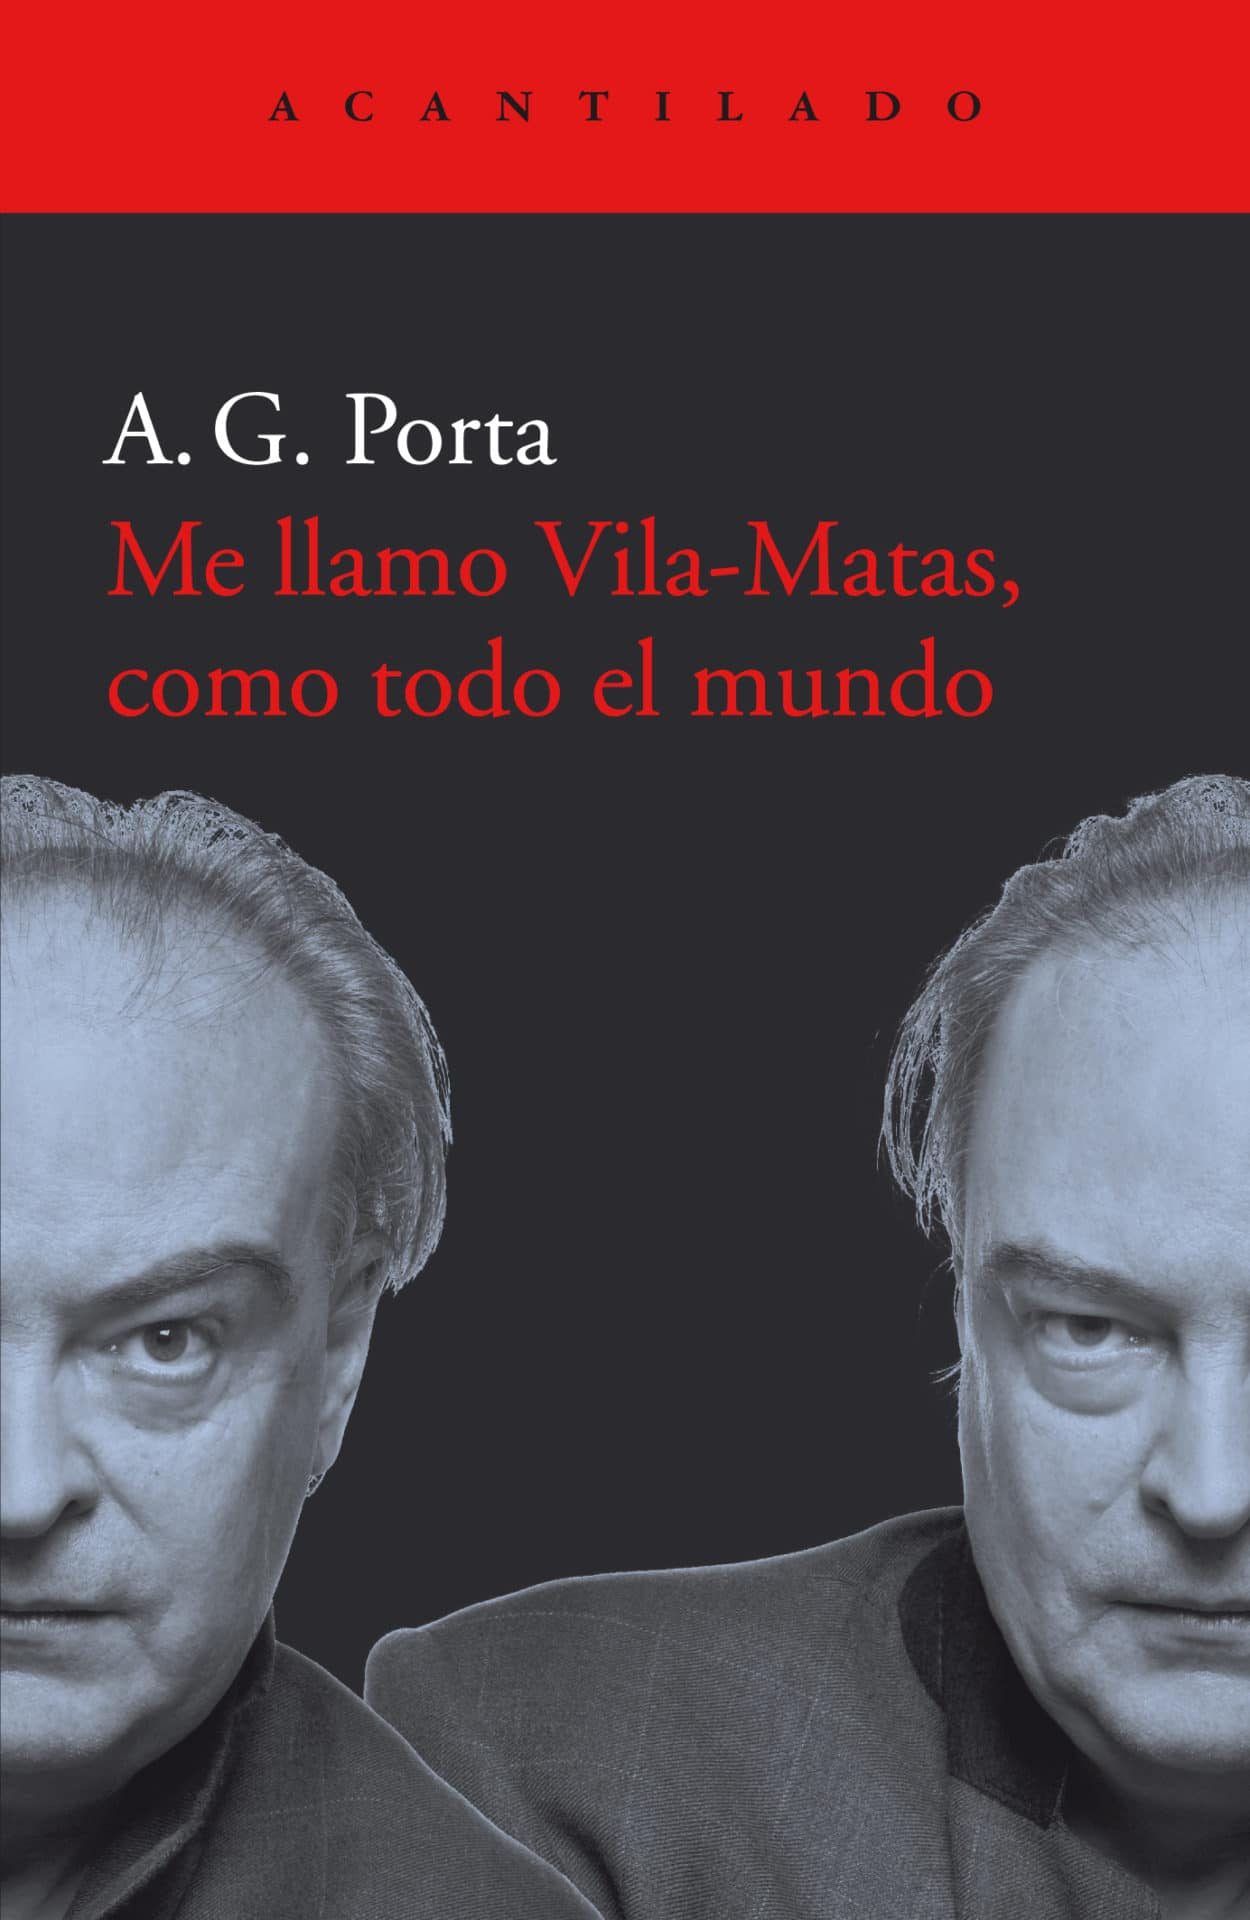 Me llamo Vila-Matas